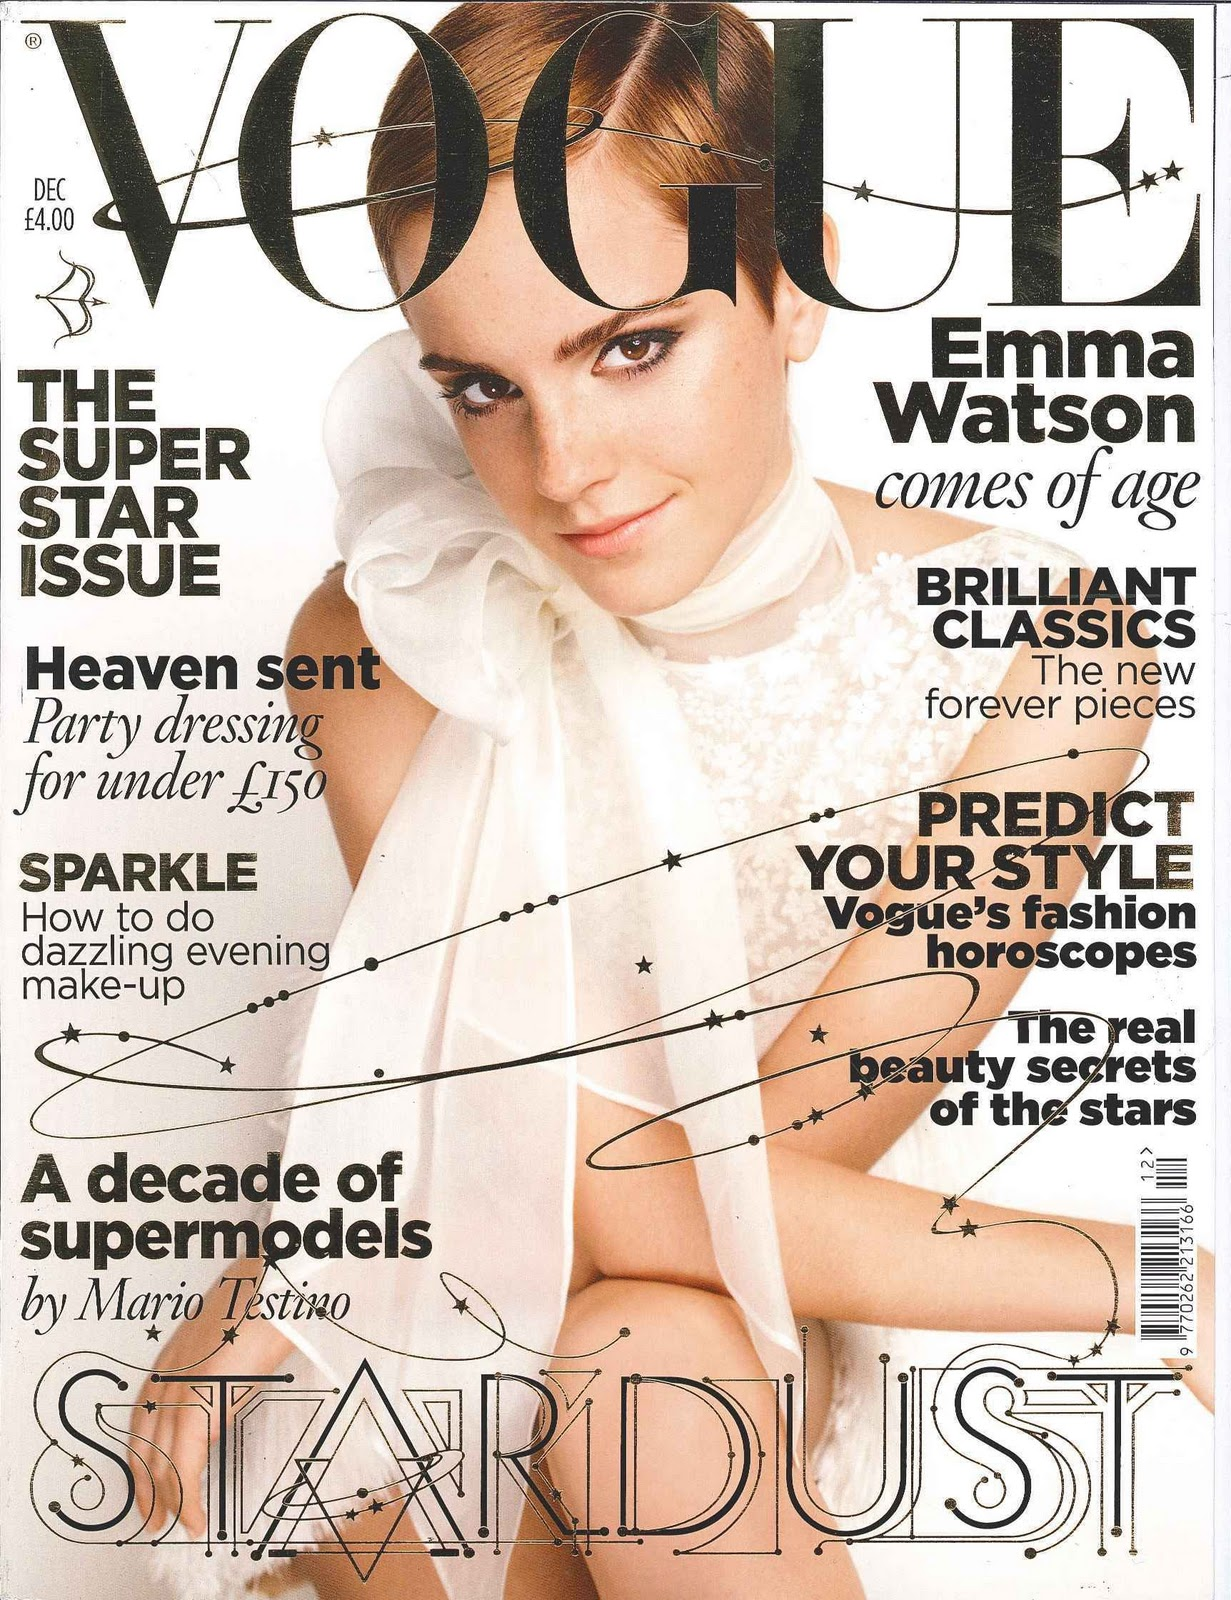 http://2.bp.blogspot.com/-VudMvjMBBQc/T2mWU2jCWVI/AAAAAAAADQQ/b_qesFo5HGY/s1600/Emma+Watson+covers+Vogue+UK+December+2010.jpg